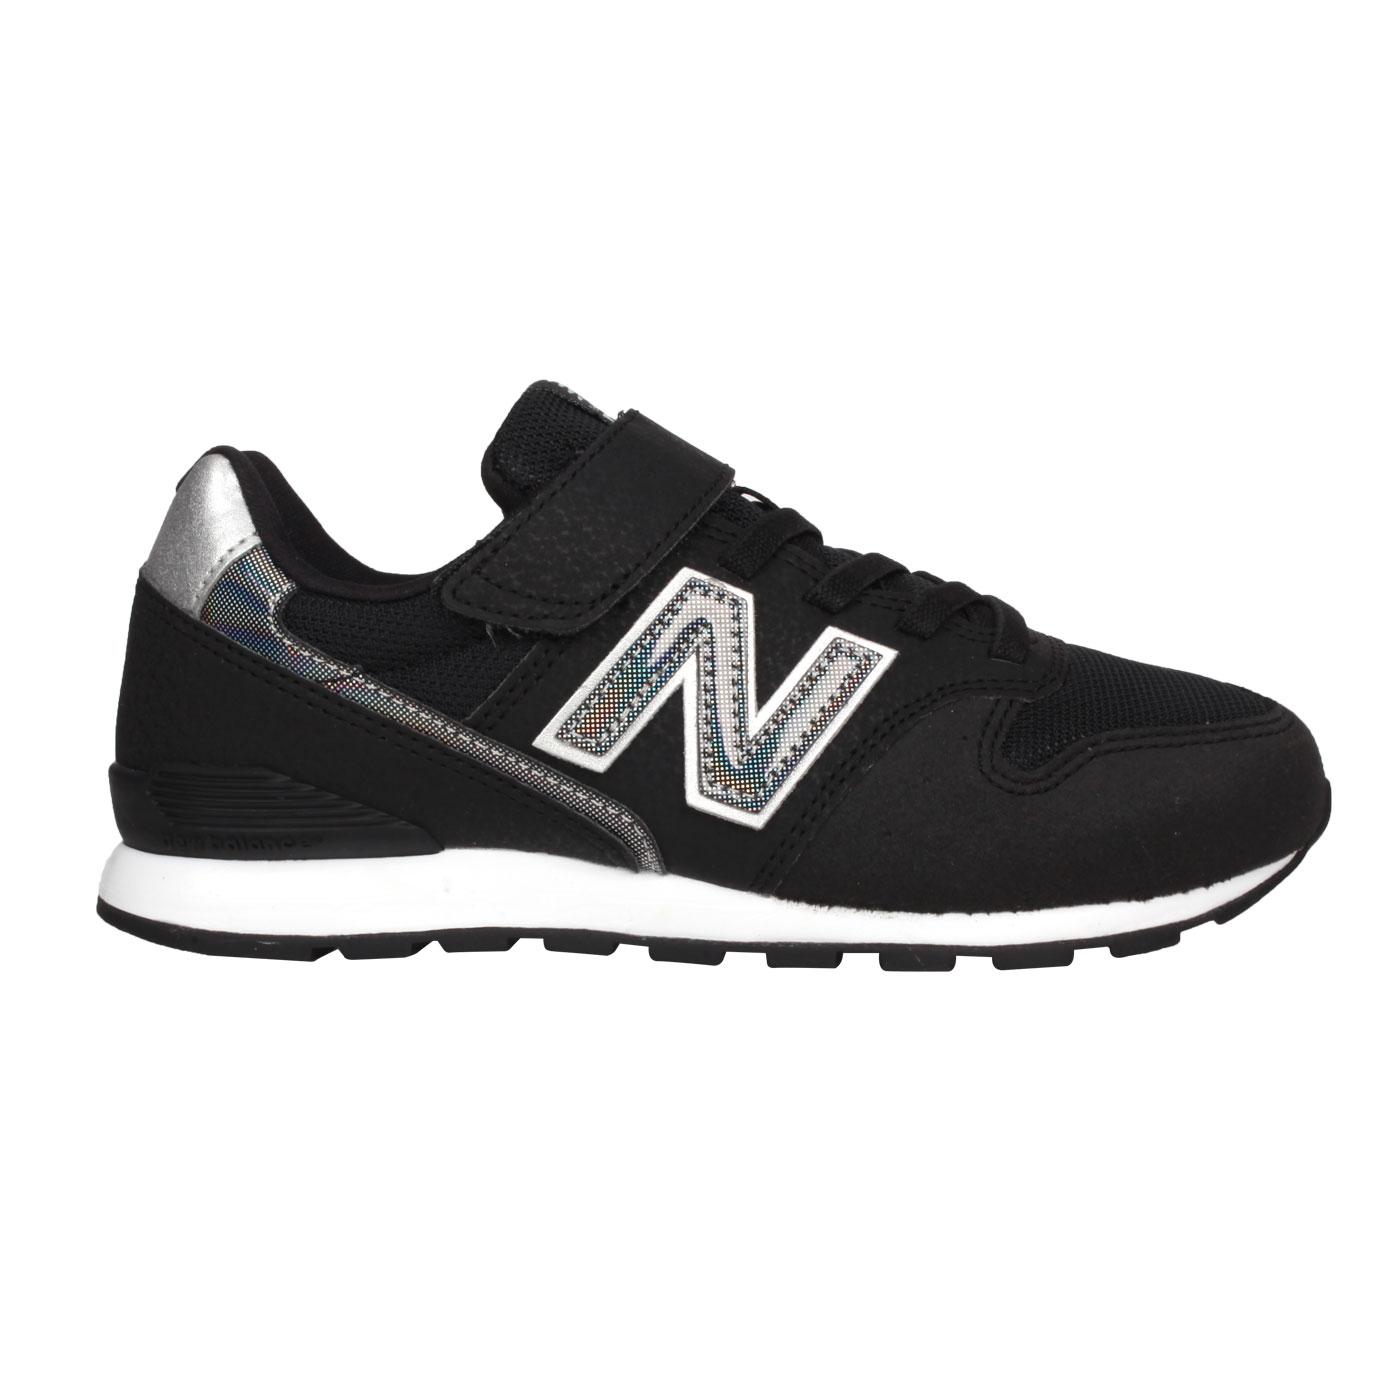 NEW BALANCE 中童運動休閒鞋-WIDE YV996HBK - 黑銀